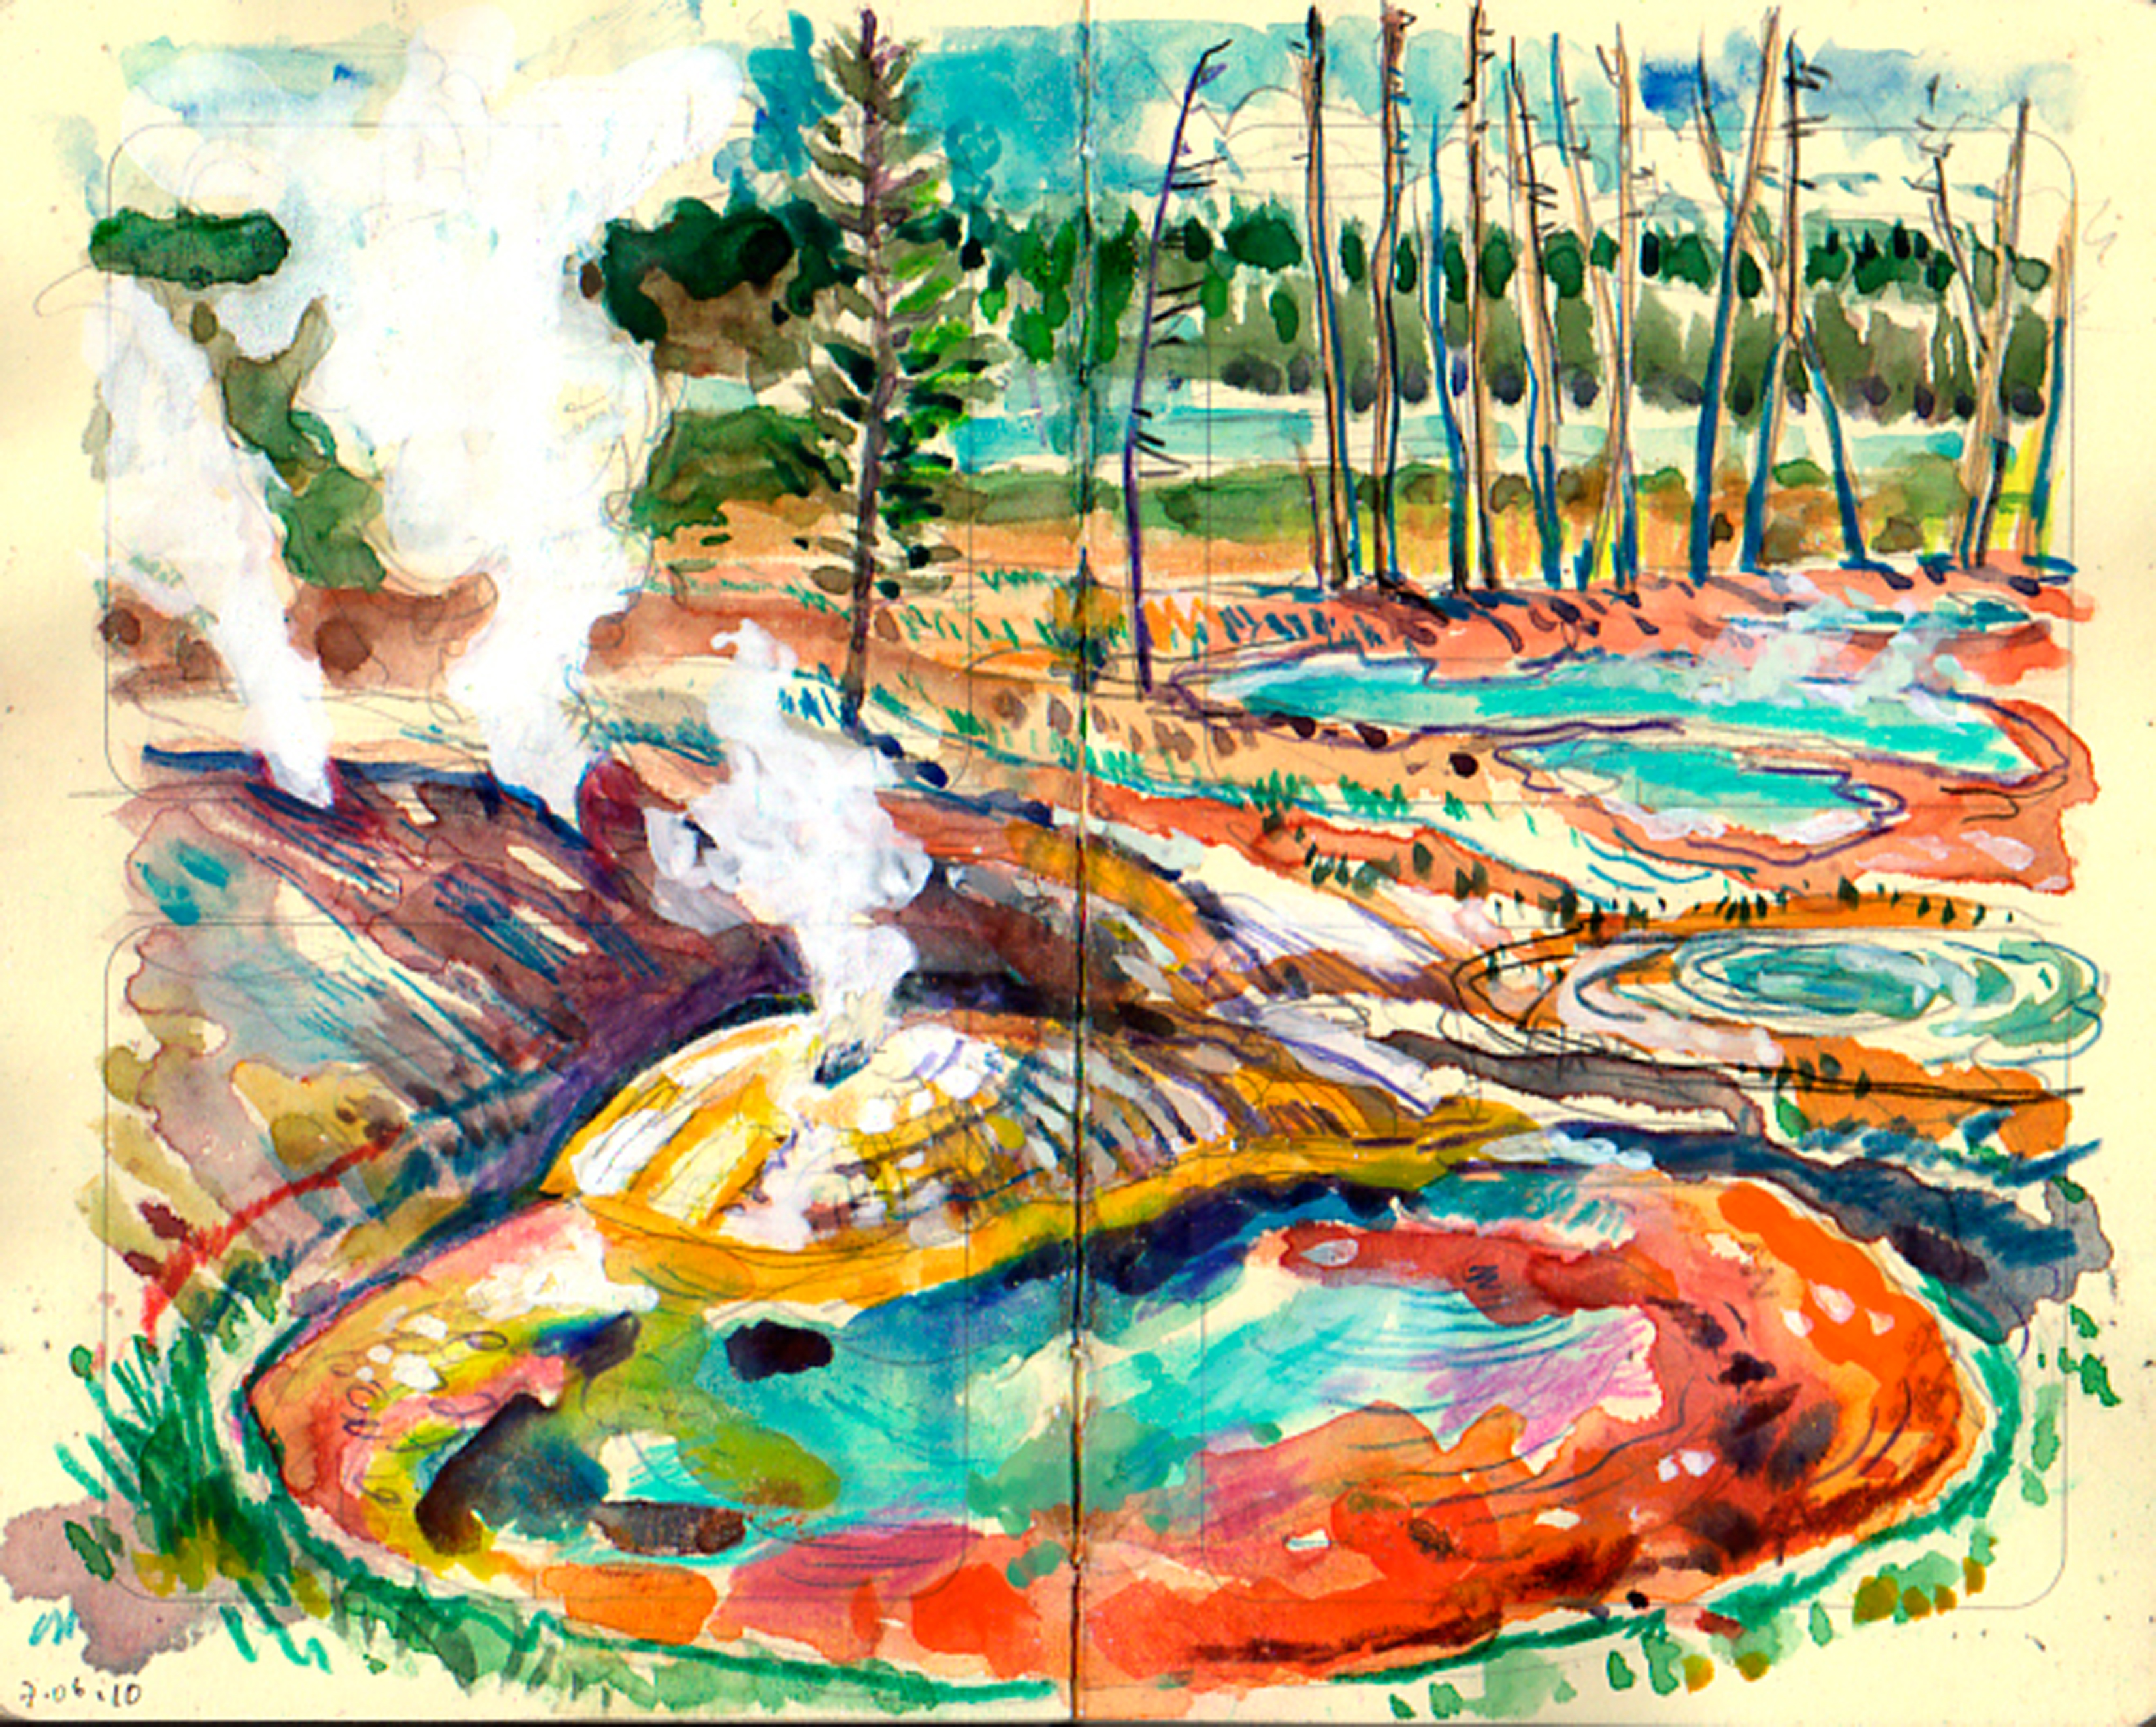 Yellowstone geysers & paint pots